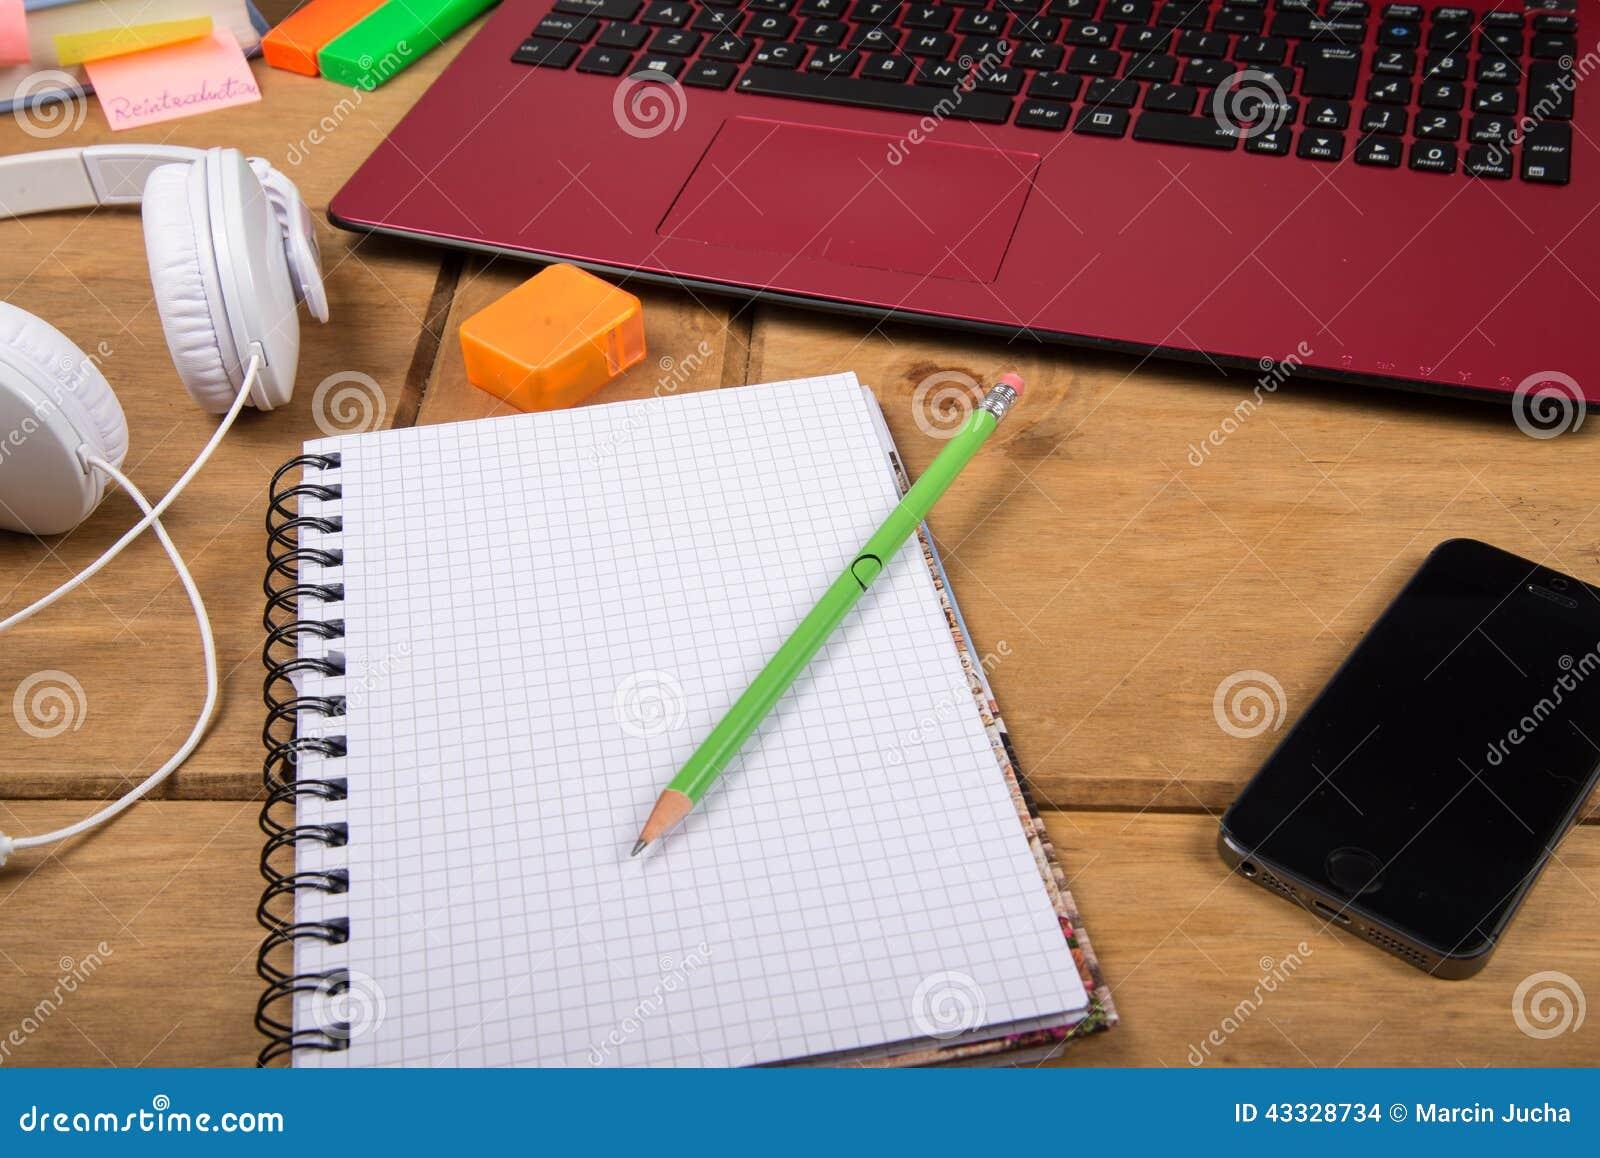 https://thumbs.dreamstime.com/z/view-college-student-desk-top-workspace-note-pad-lap-pencil-headphones-43328734.jpg